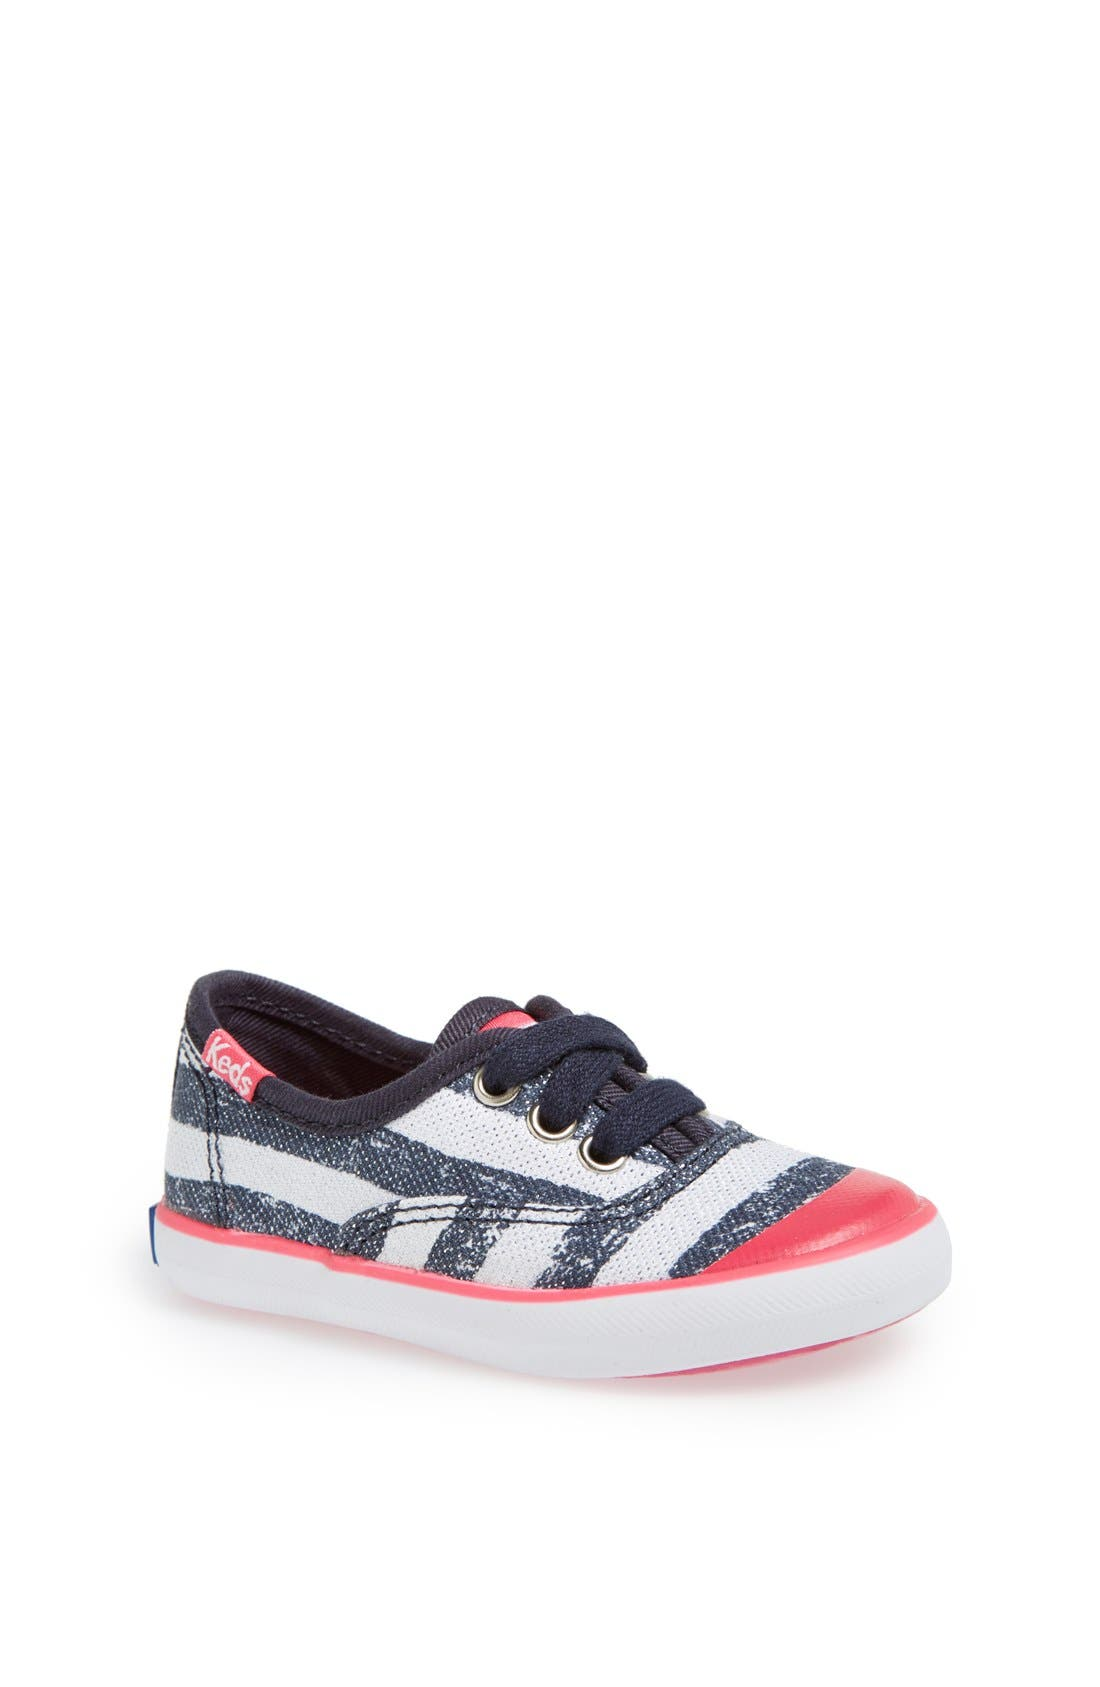 Main Image - Keds® 'Champion K' Sneaker (Walker & Toddler)